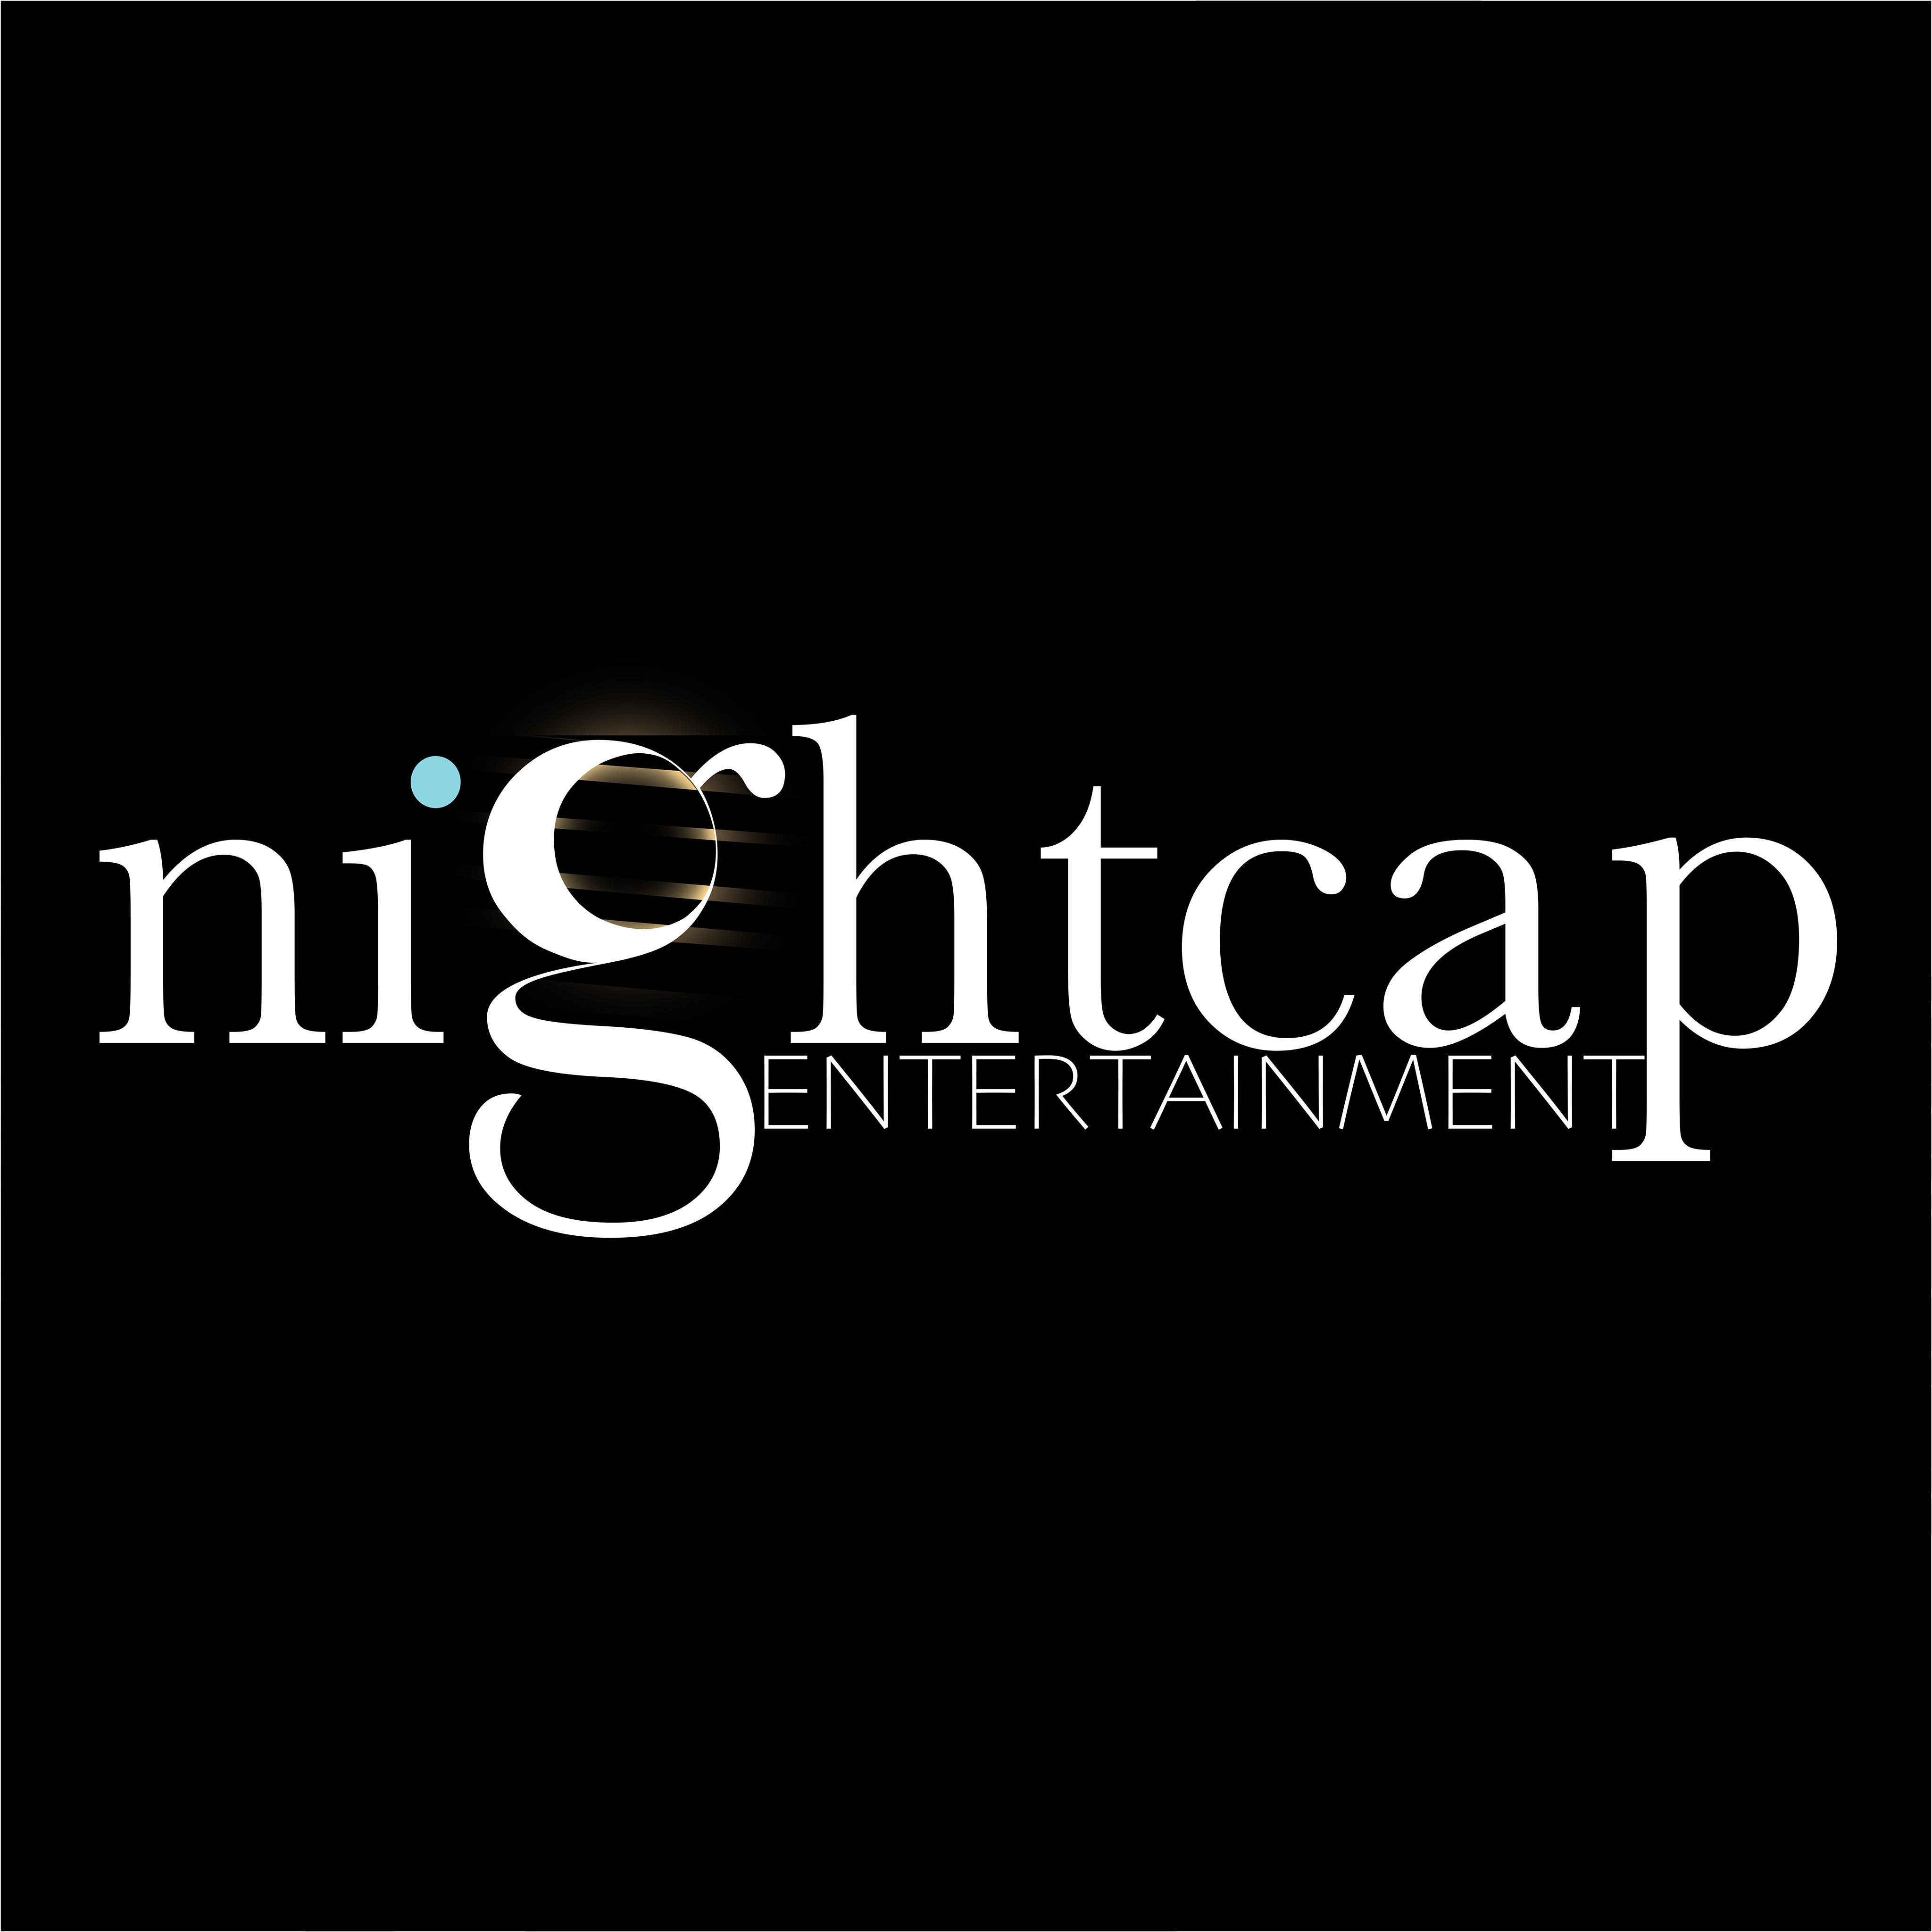 Nightcap Entertainment